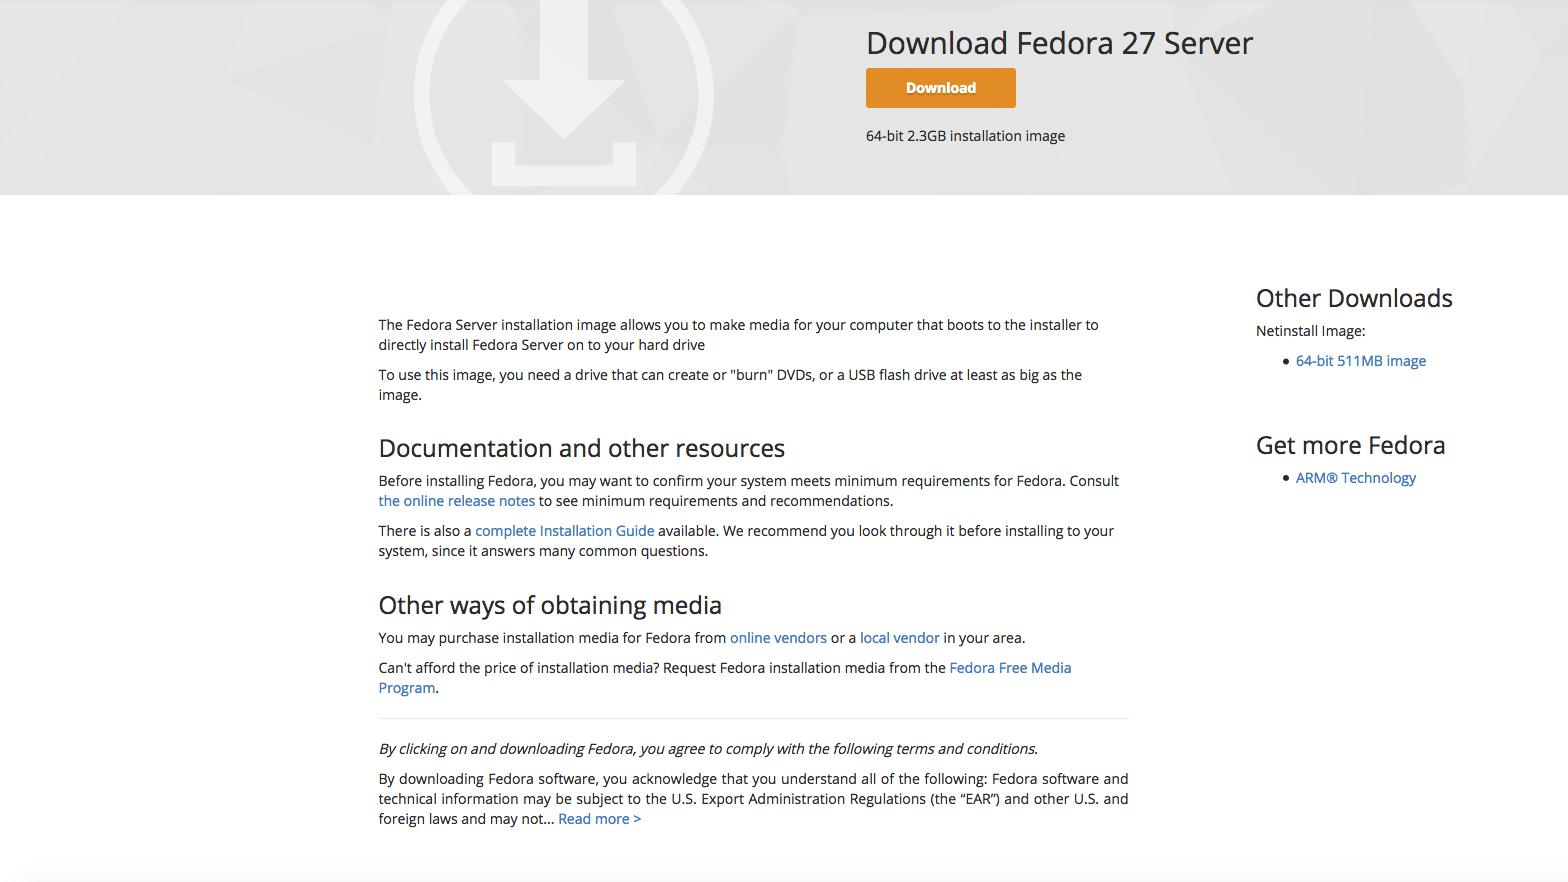 Fedora Server